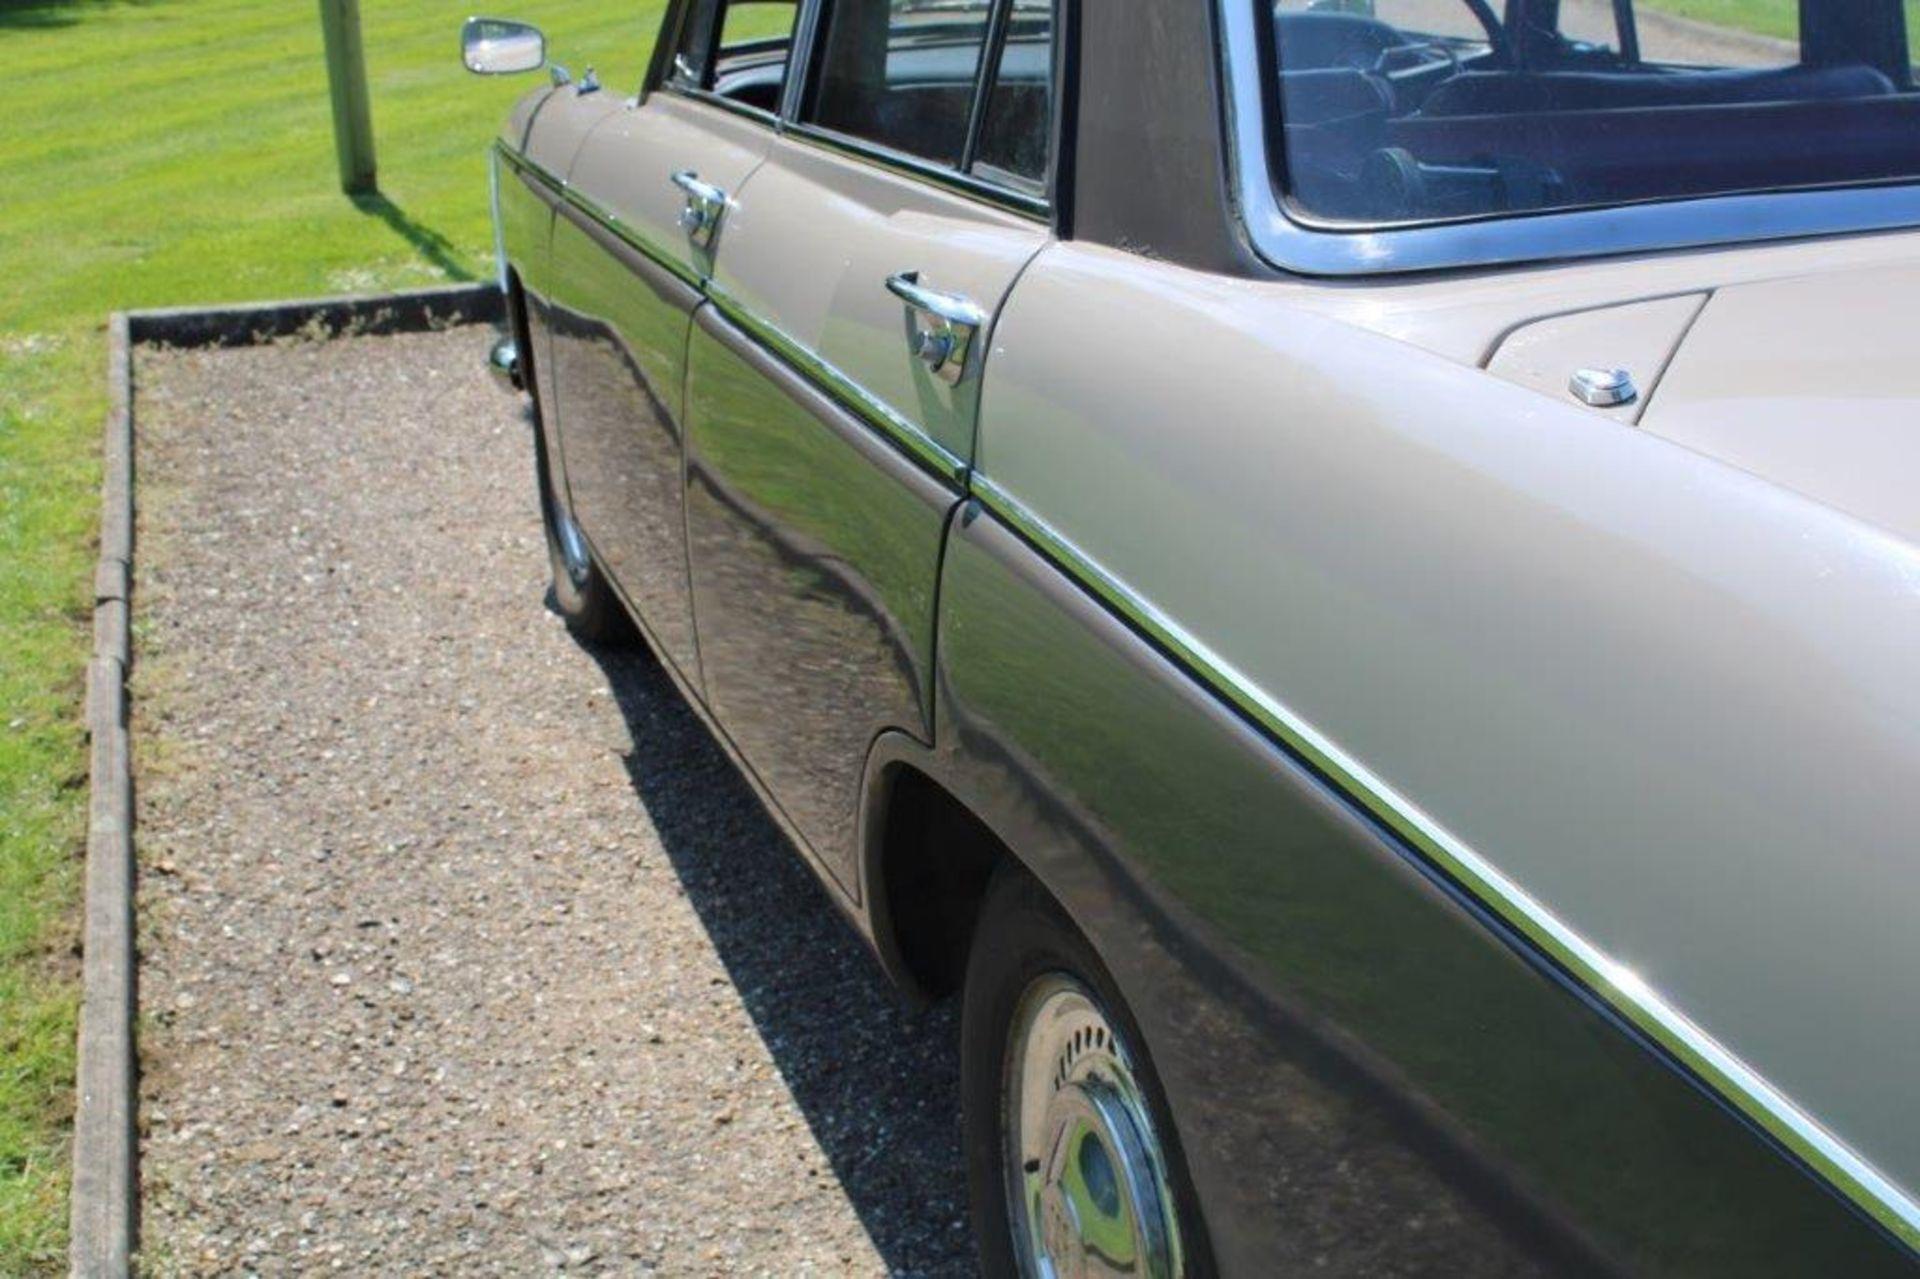 1969 Wolseley 16/60 Auto - Image 10 of 31